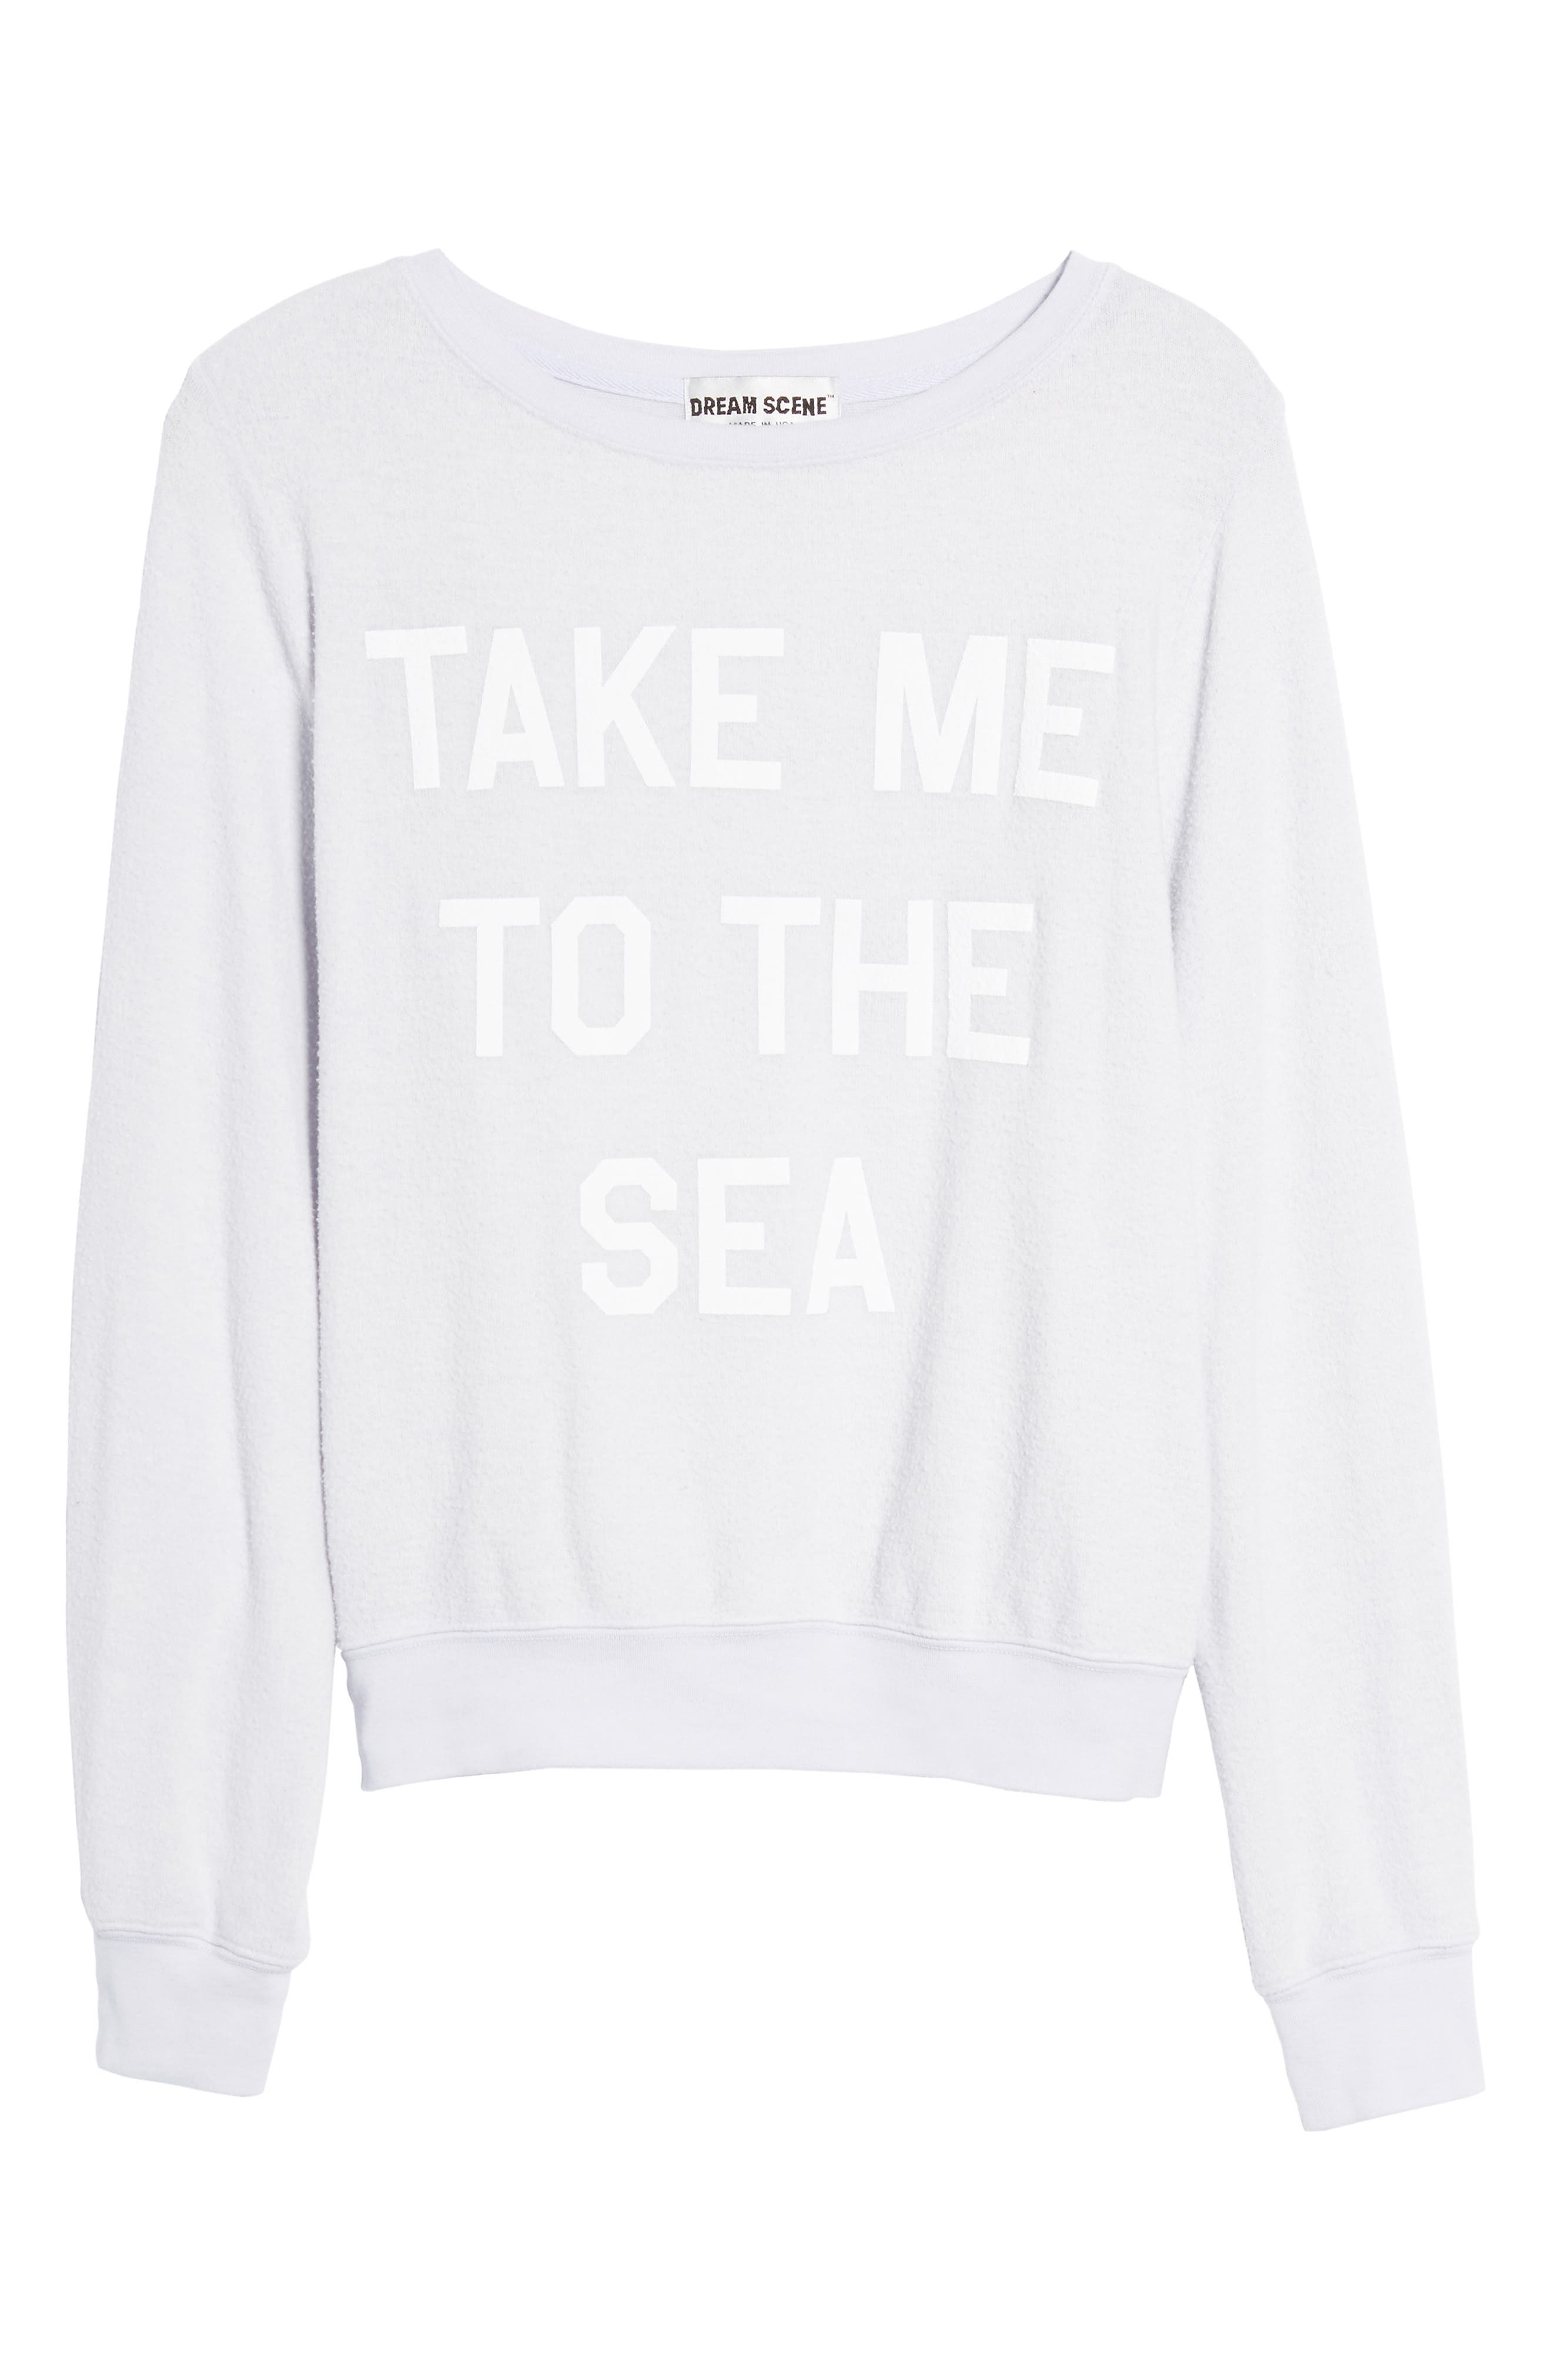 Take Me to the Sea Sweatshirt,                             Alternate thumbnail 6, color,                             450